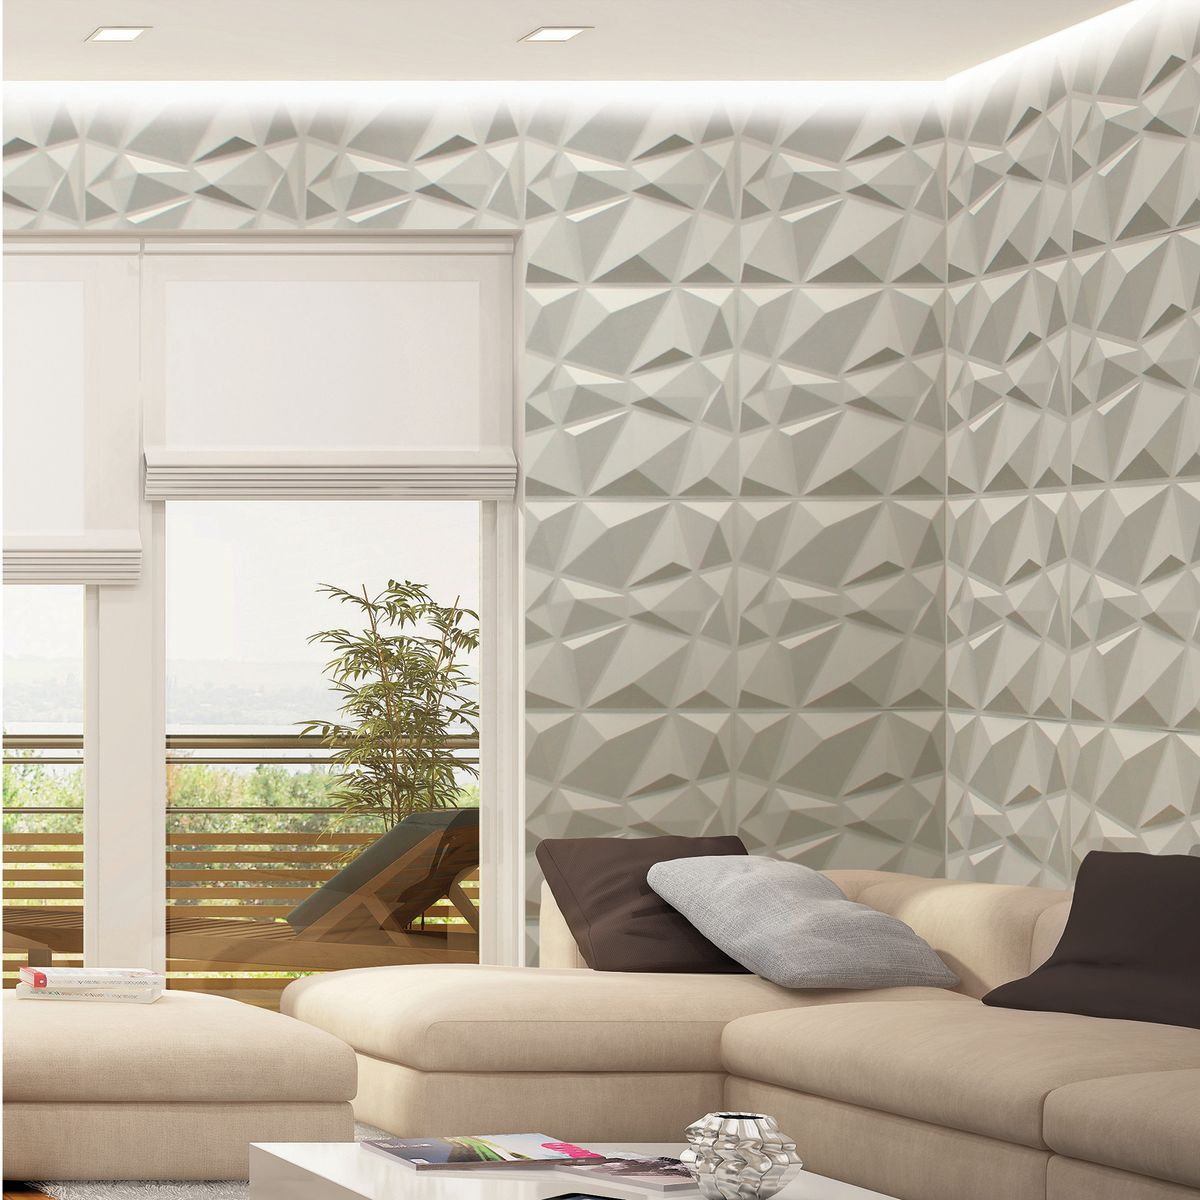 Rivestimento parete legno bianco ts36 regardsdefemmes - Rivestimento decorativo pareti ...